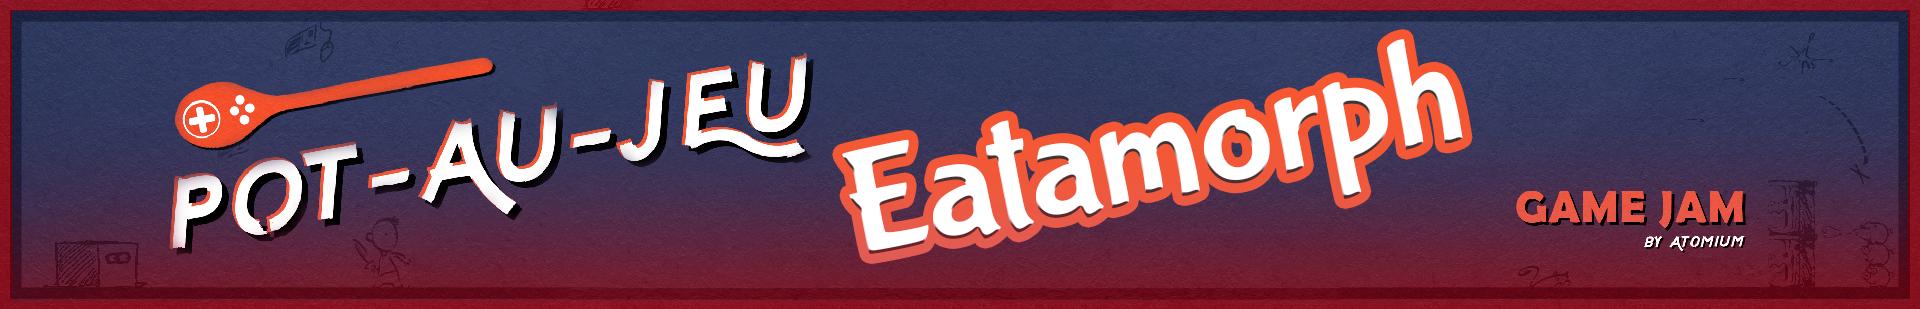 Eatamorph